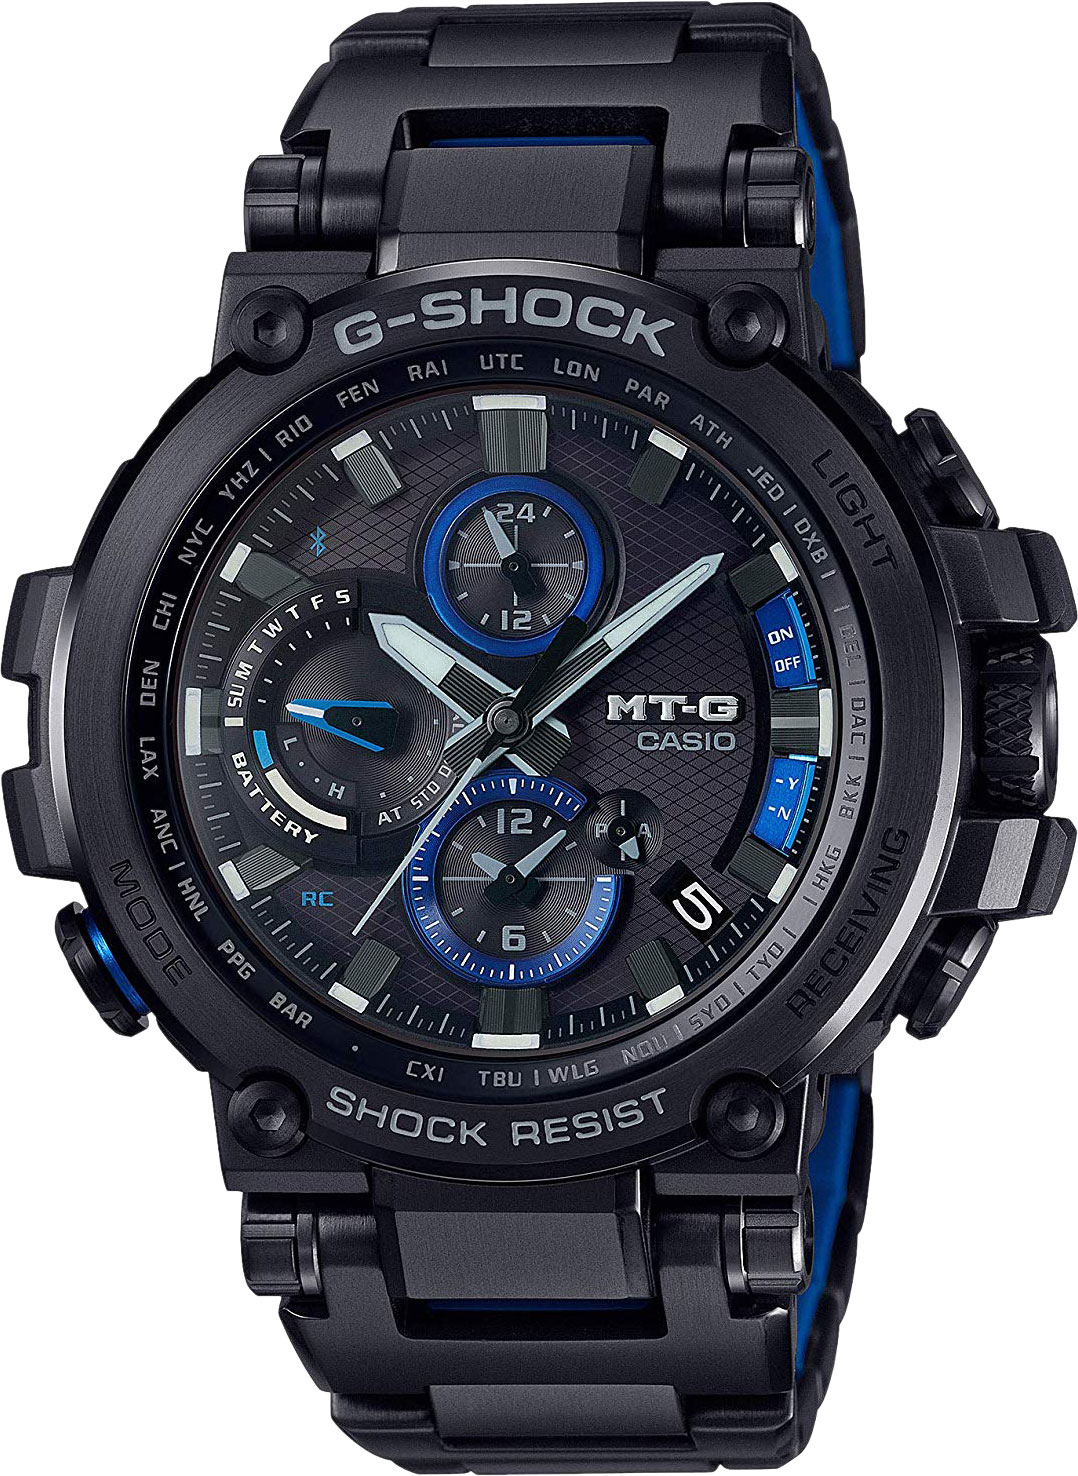 Мужские часы Casio MTG-B1000BD-1A толстовка lacoste sh8600 mtg 2015 sh8600 mtg i1